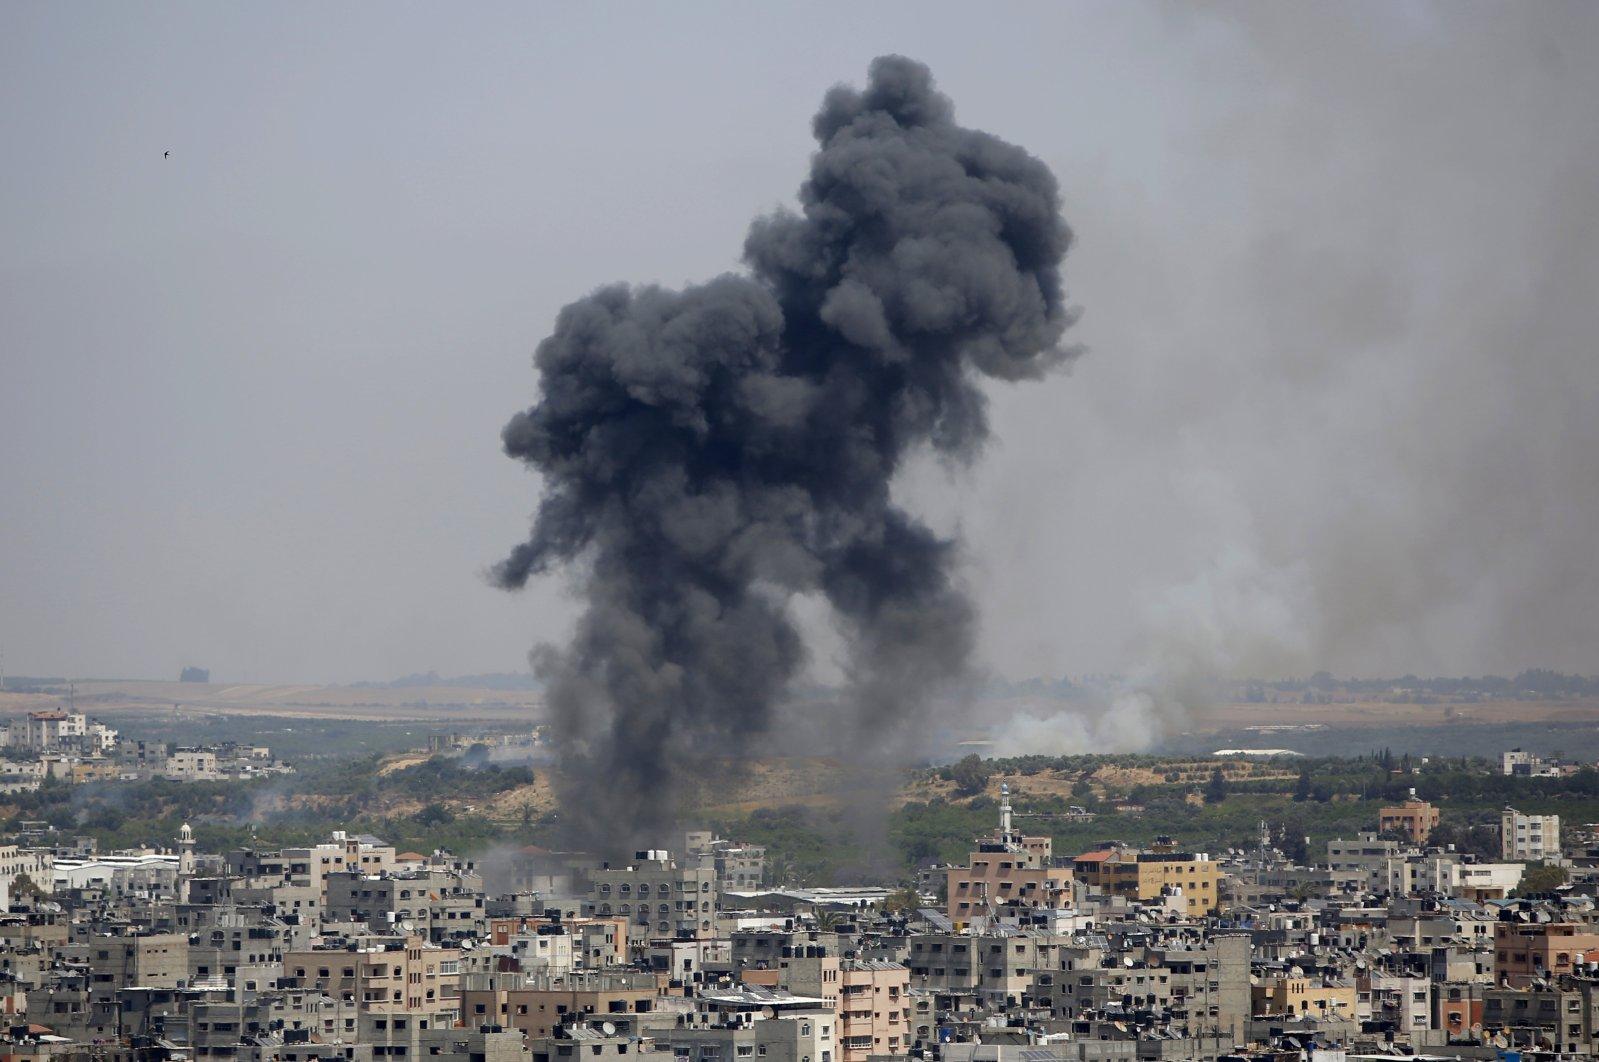 Smoke rises after an Israeli airstrike in Gaza City, the Gaza strip, Palestine, May 11, 2021. (AP Photo)